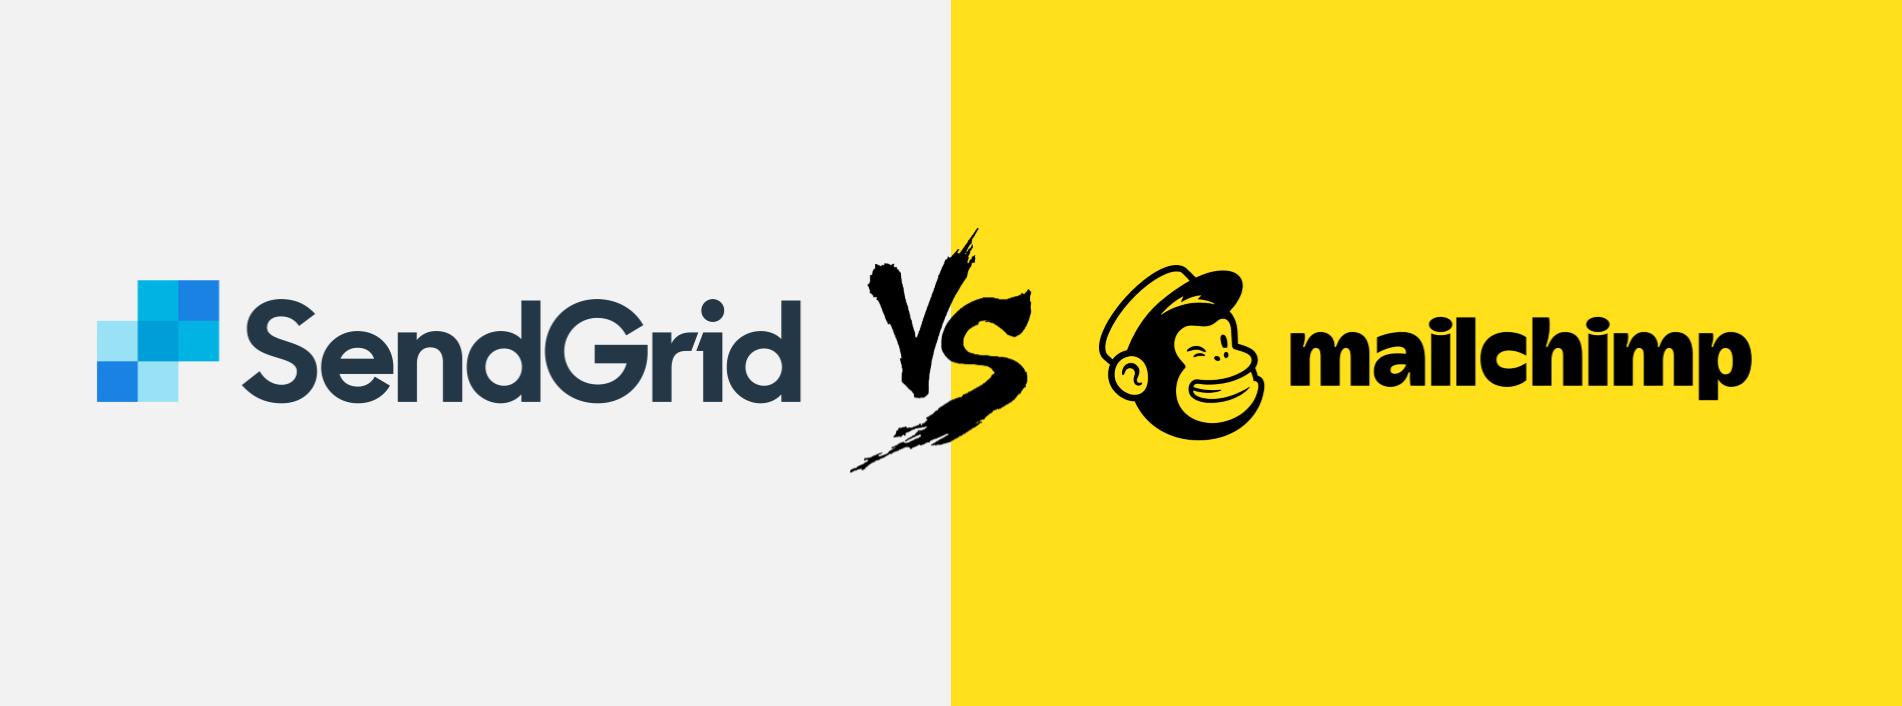 SendGrid vs Mailchimp